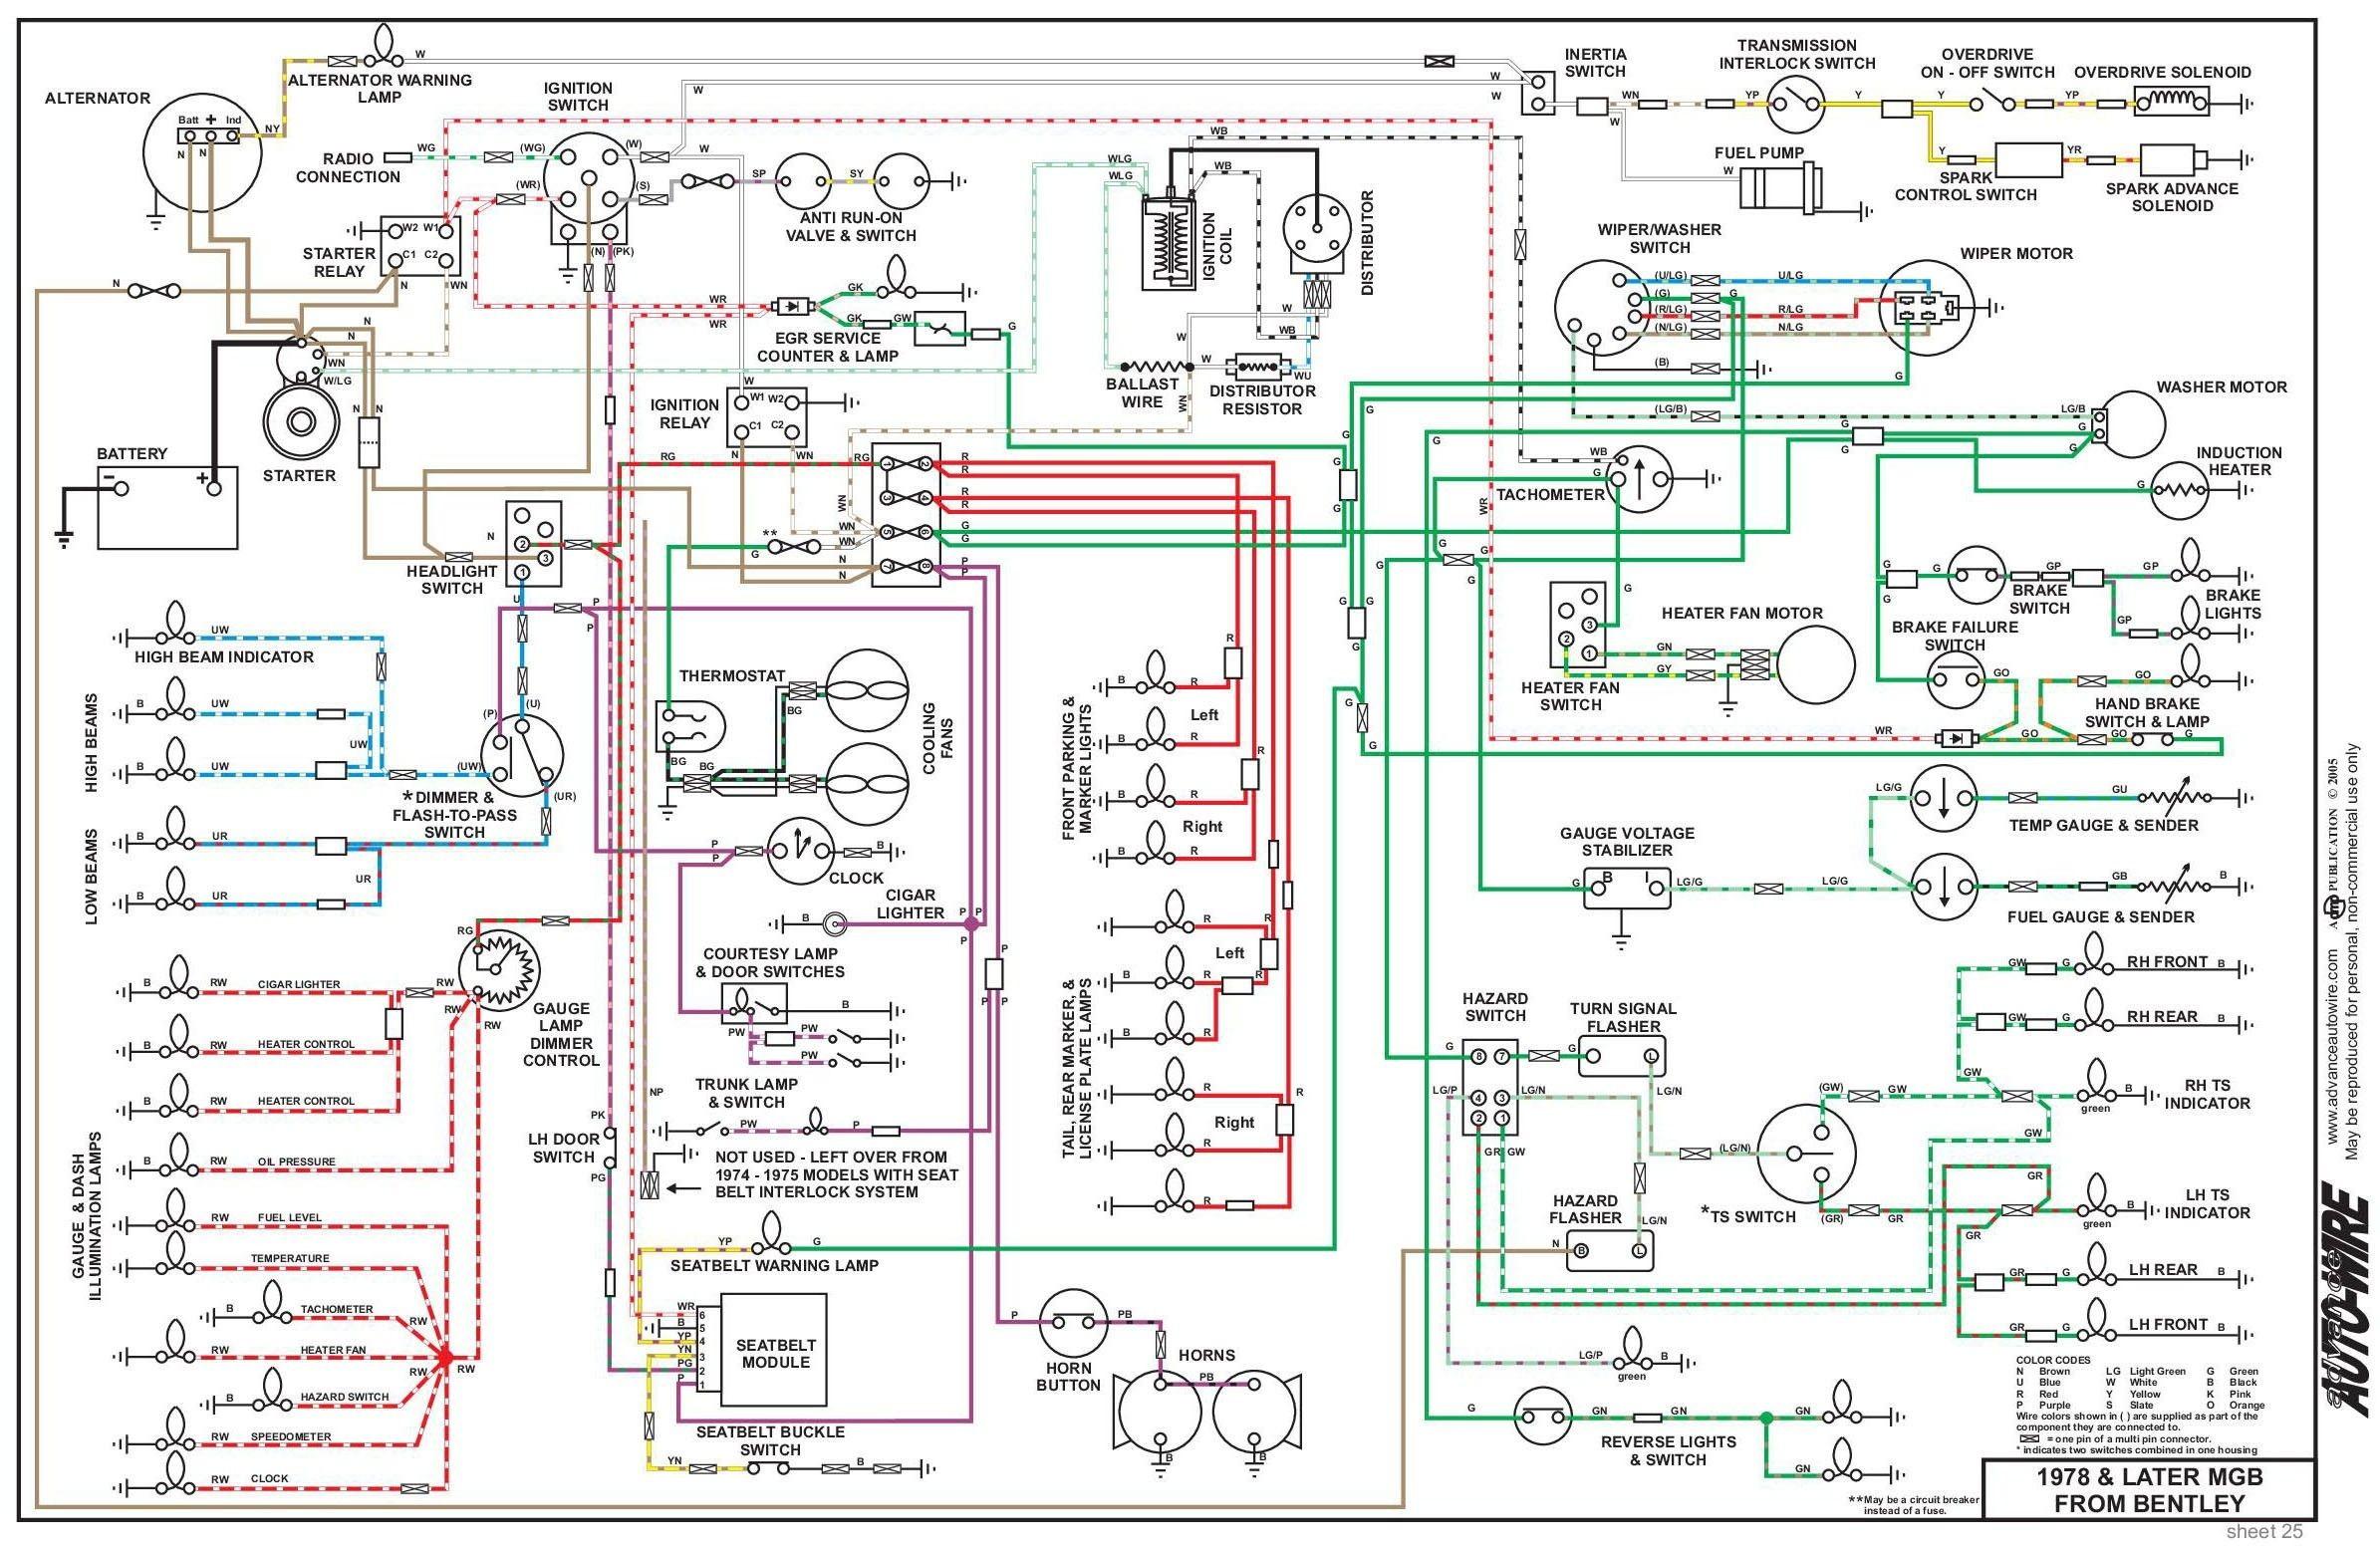 Ford Alternator Wiring Diagrams Inspirational Morris Minor Wiring Diagram with Alternator Of Ford Alternator Wiring Diagrams